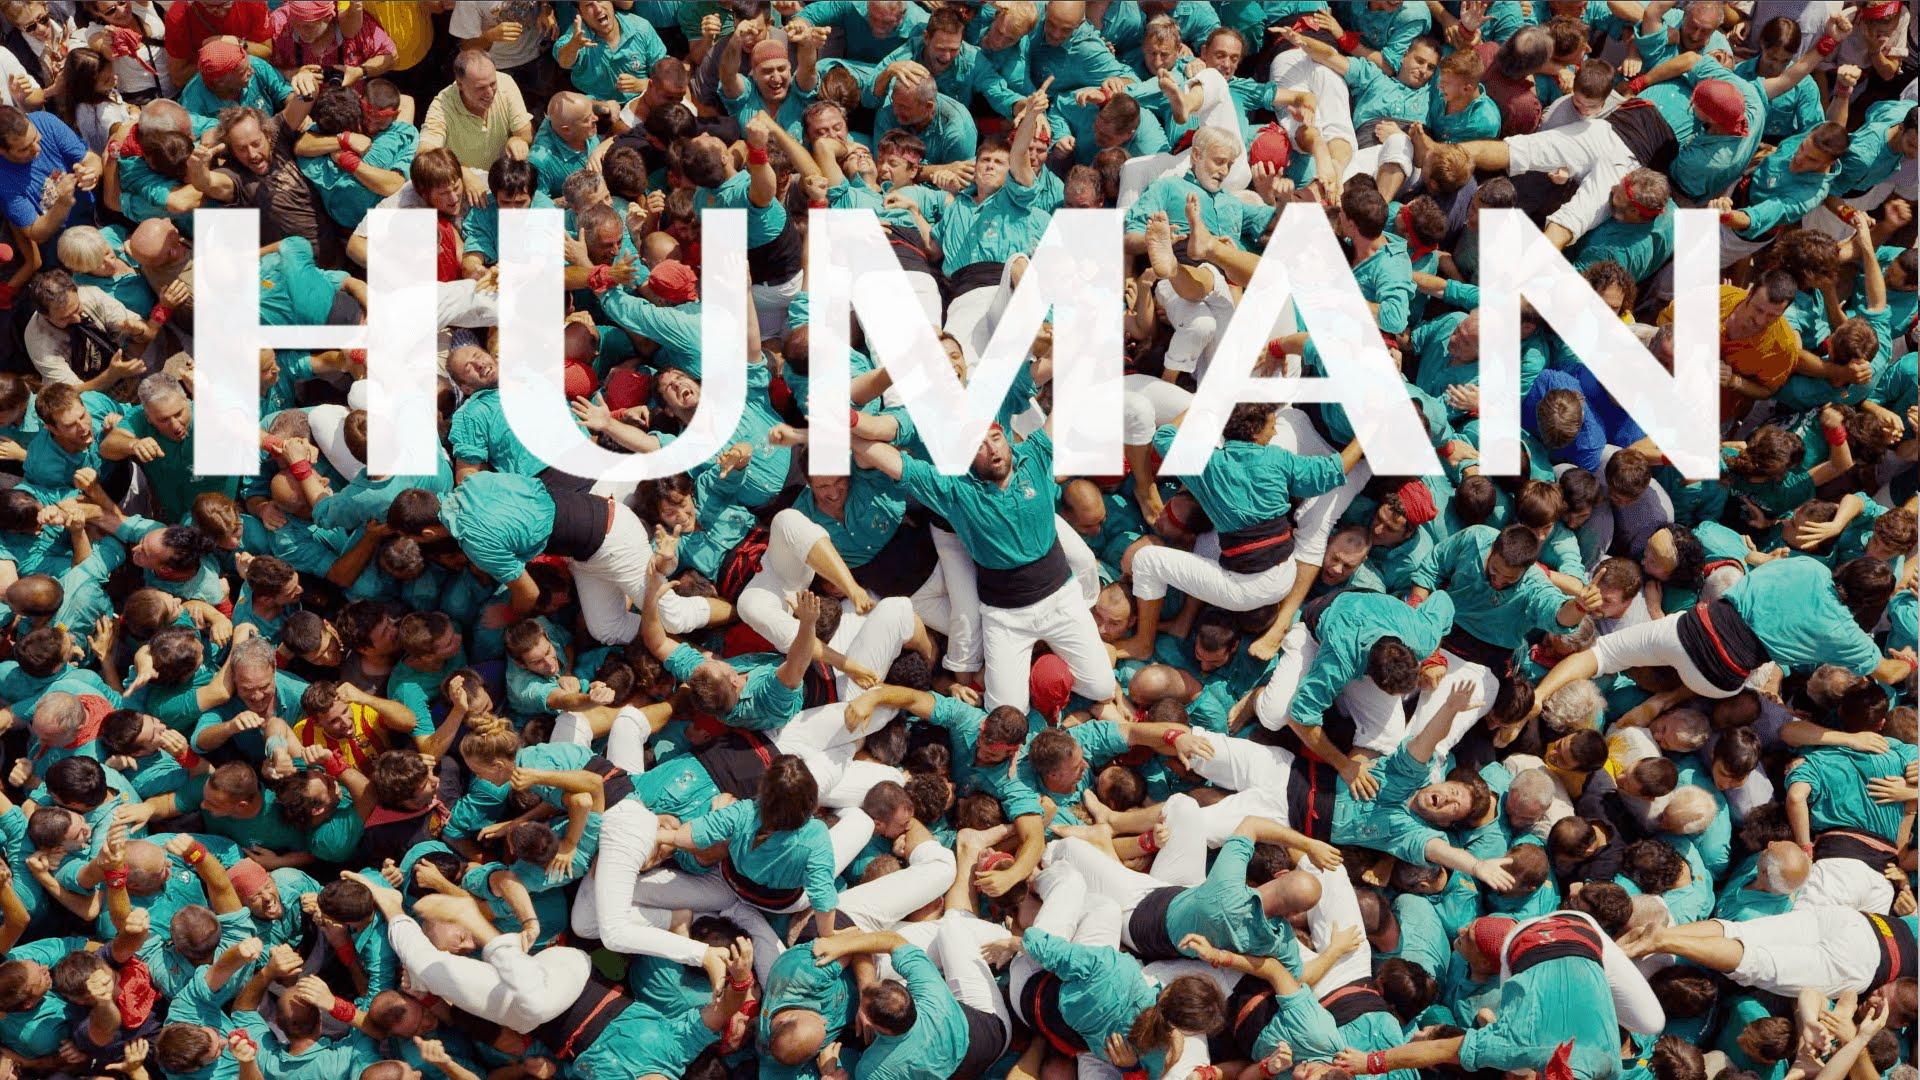 Humans Film